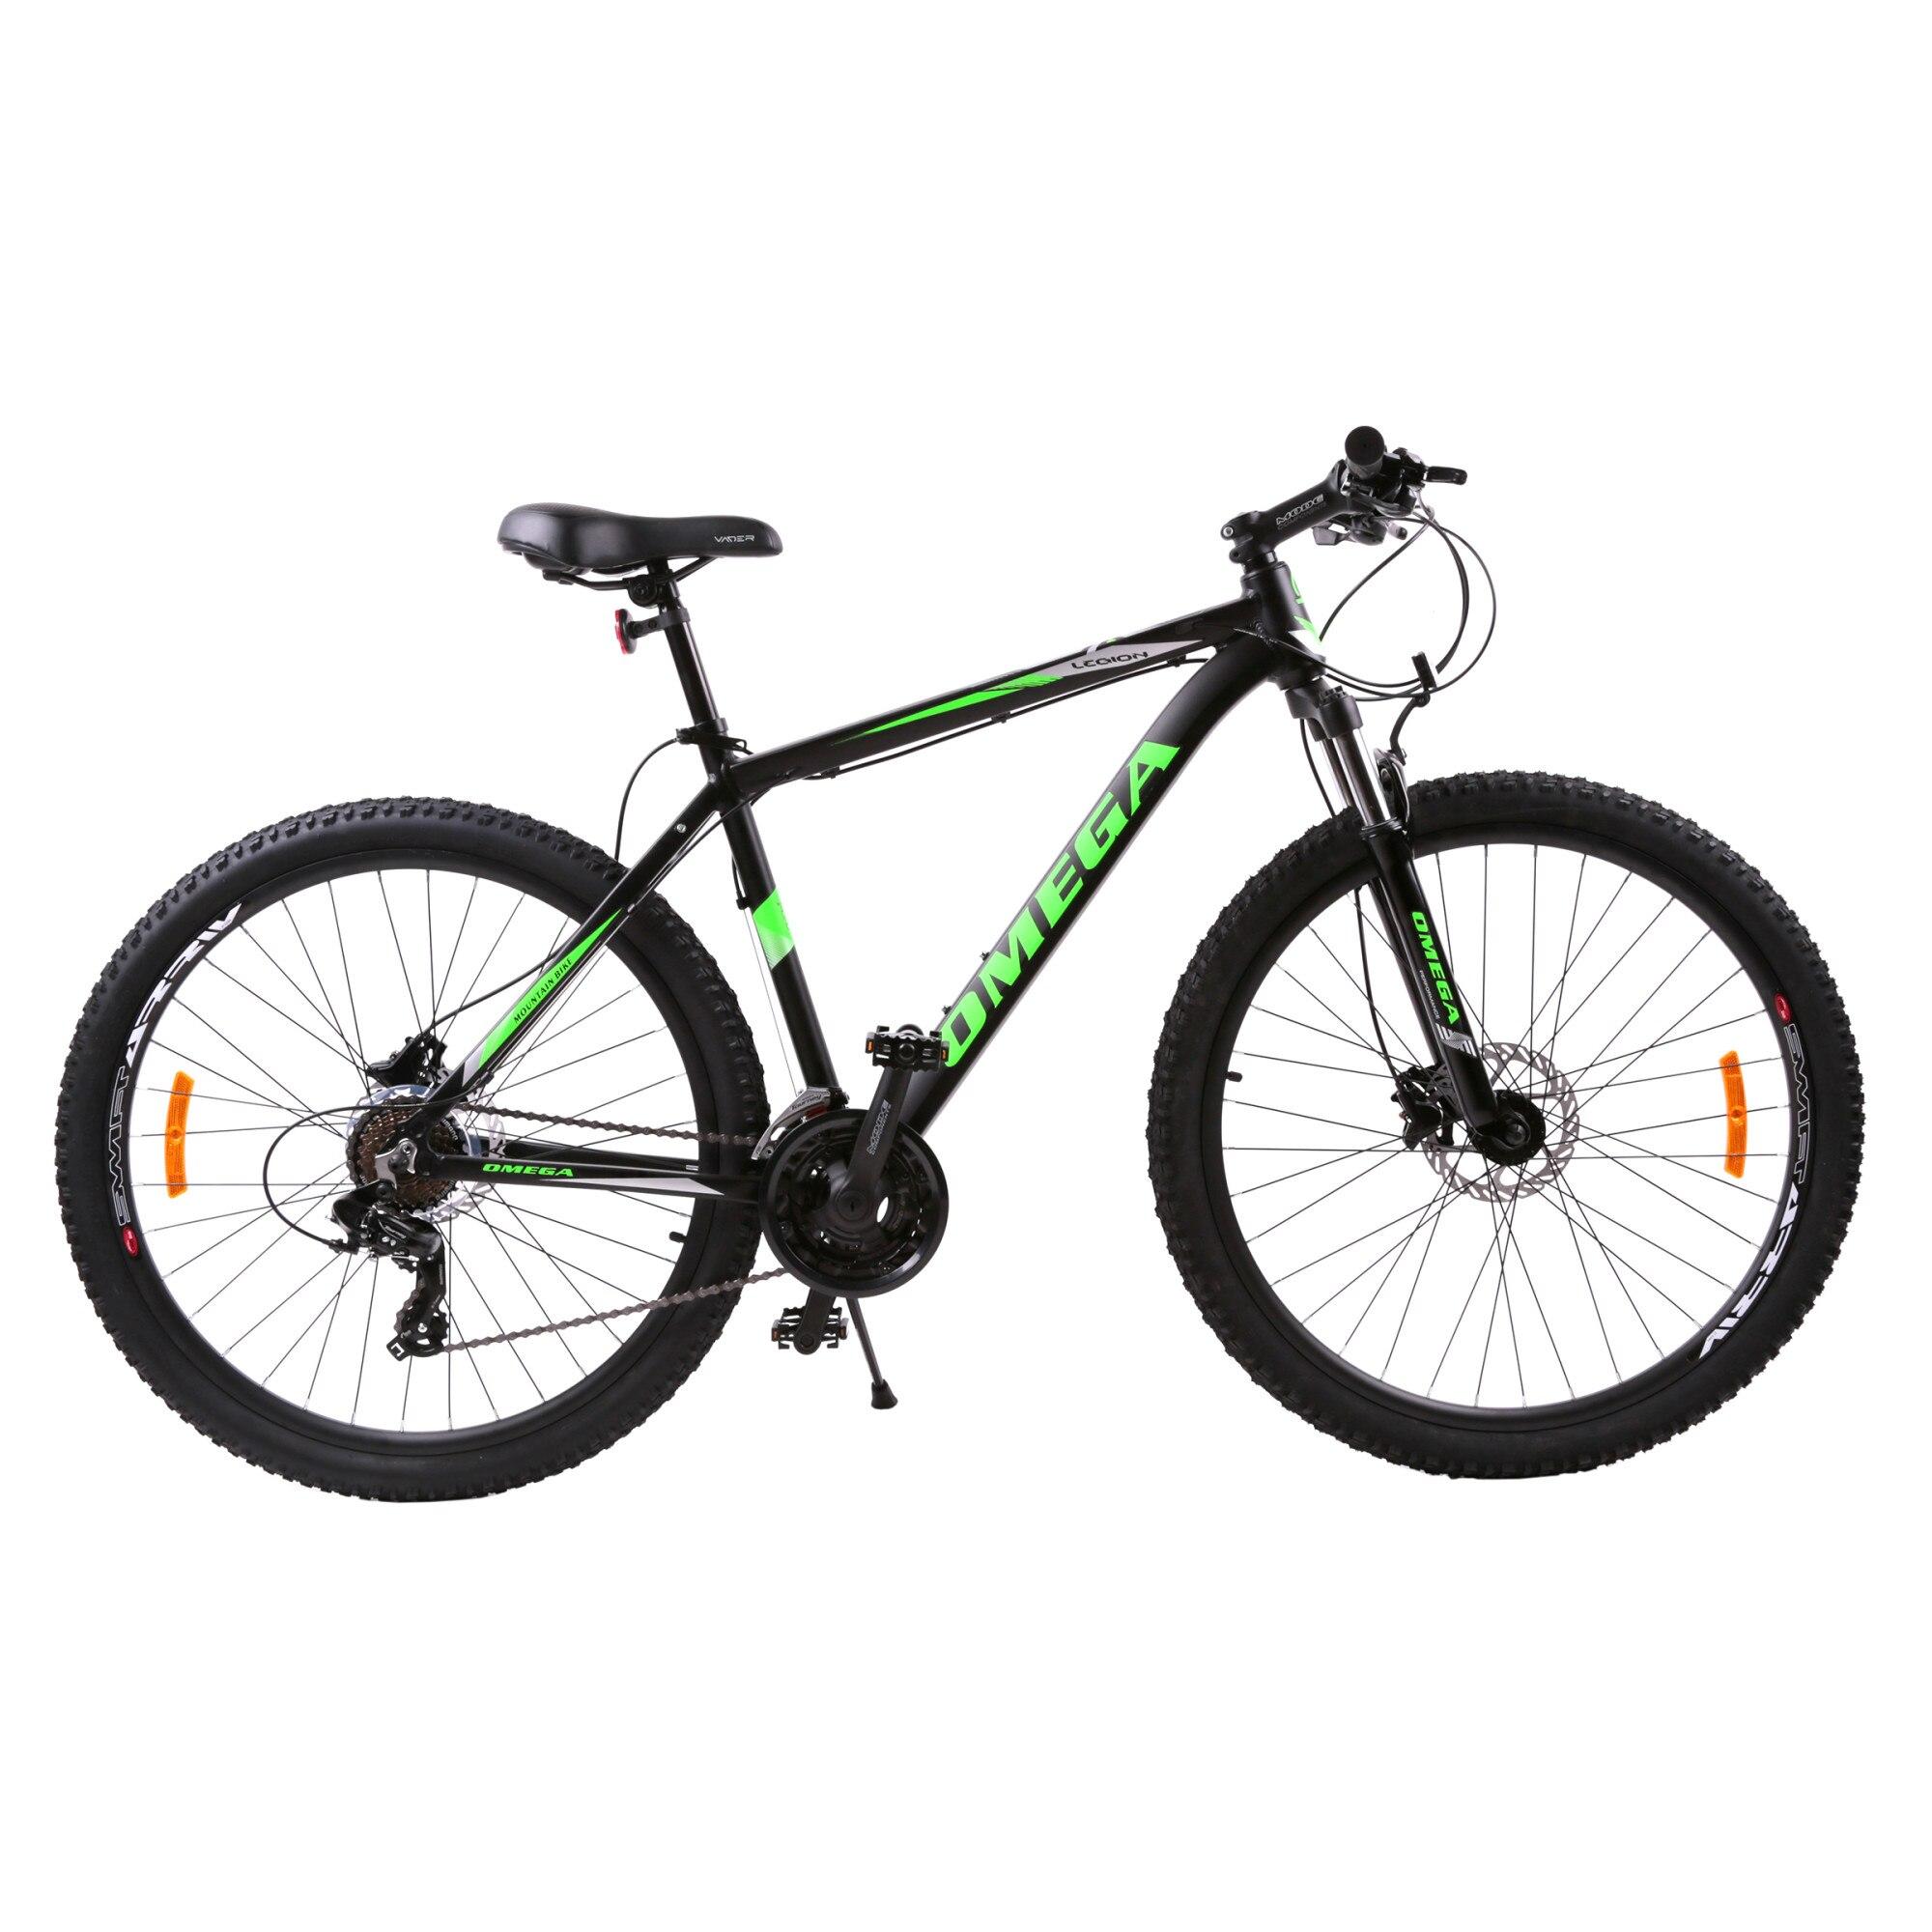 Fotografie Bicicleta MTB 29-er Omega Legion, Hidraulic disk, Black/Green